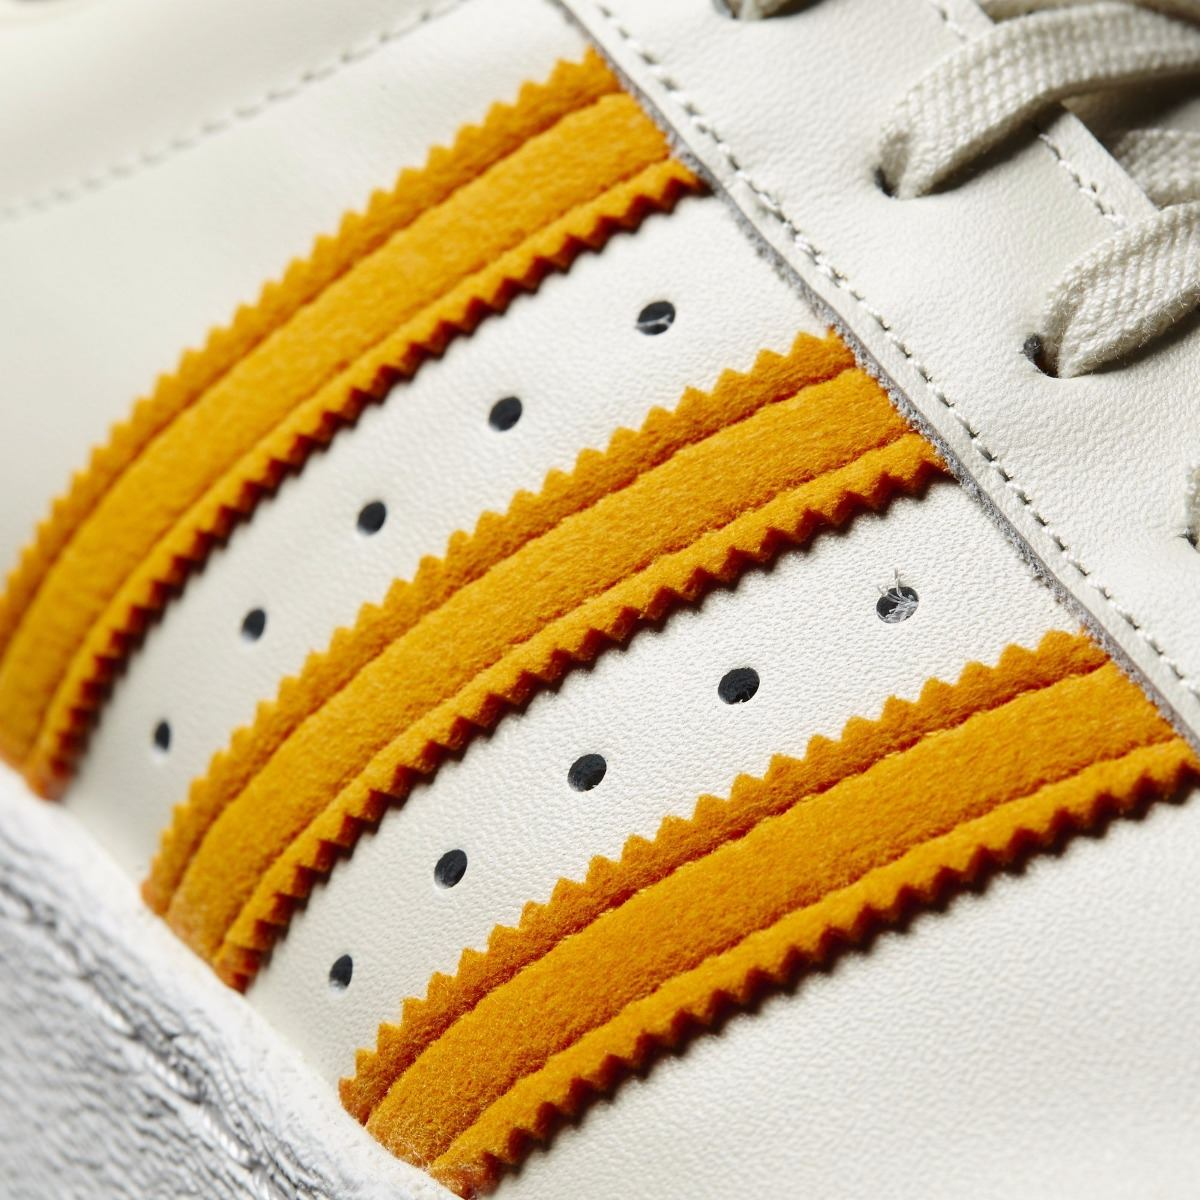 Zapatillas adidas Superstar 80s Originals Usa